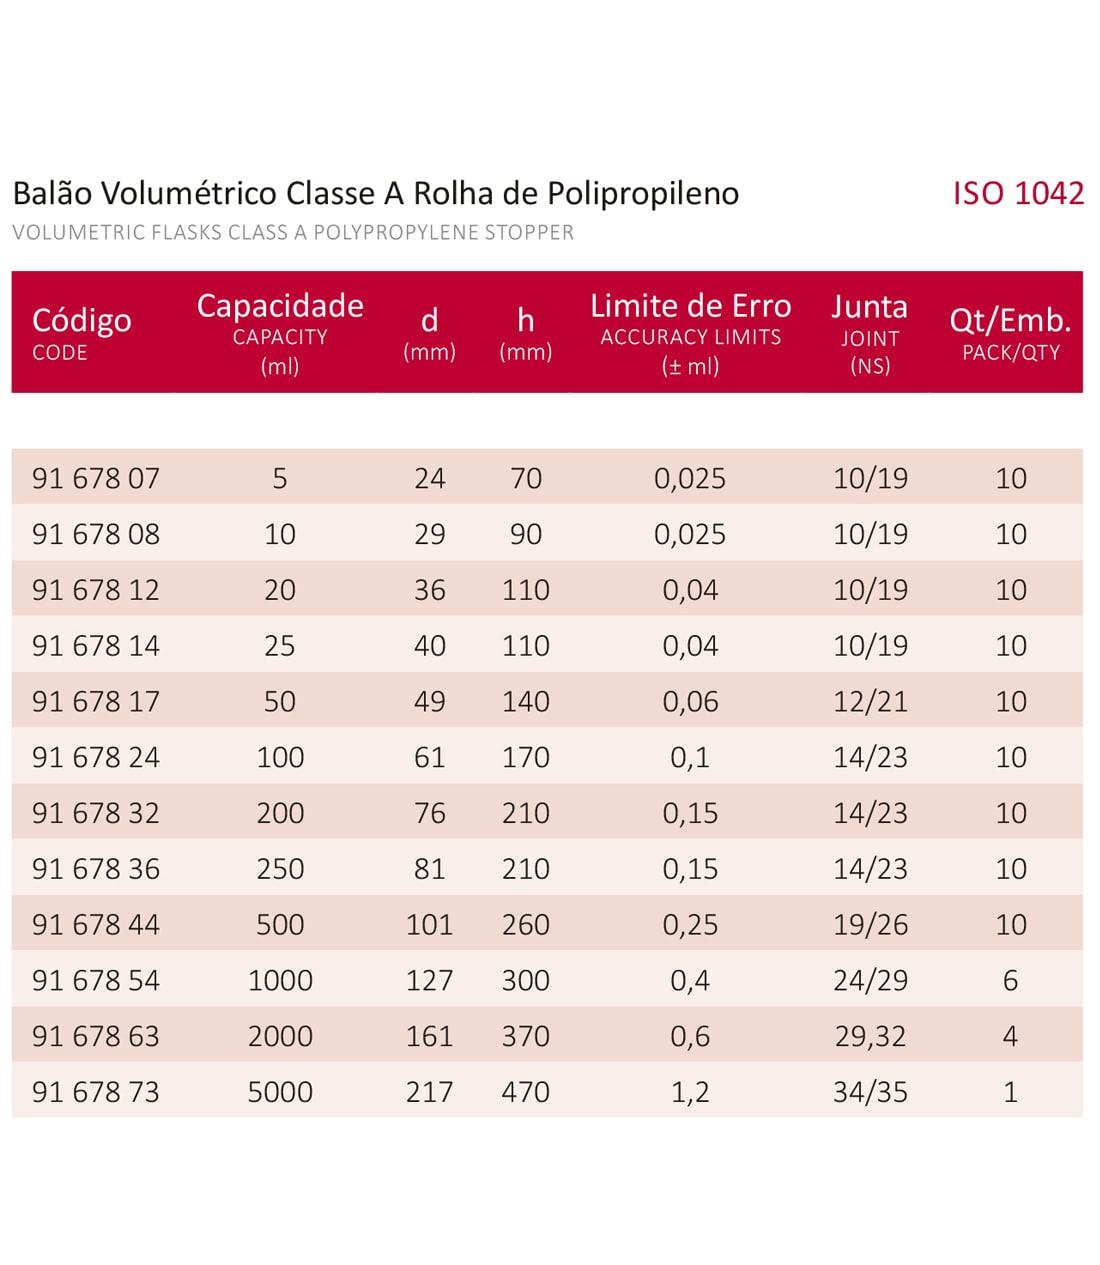 BALÃO VOLUMÉTRICO CLASSE A ROLHA POLI C/ CERTIFICADO RBC 2000 ML - Marca Laborglas - Cód. 9167863-R